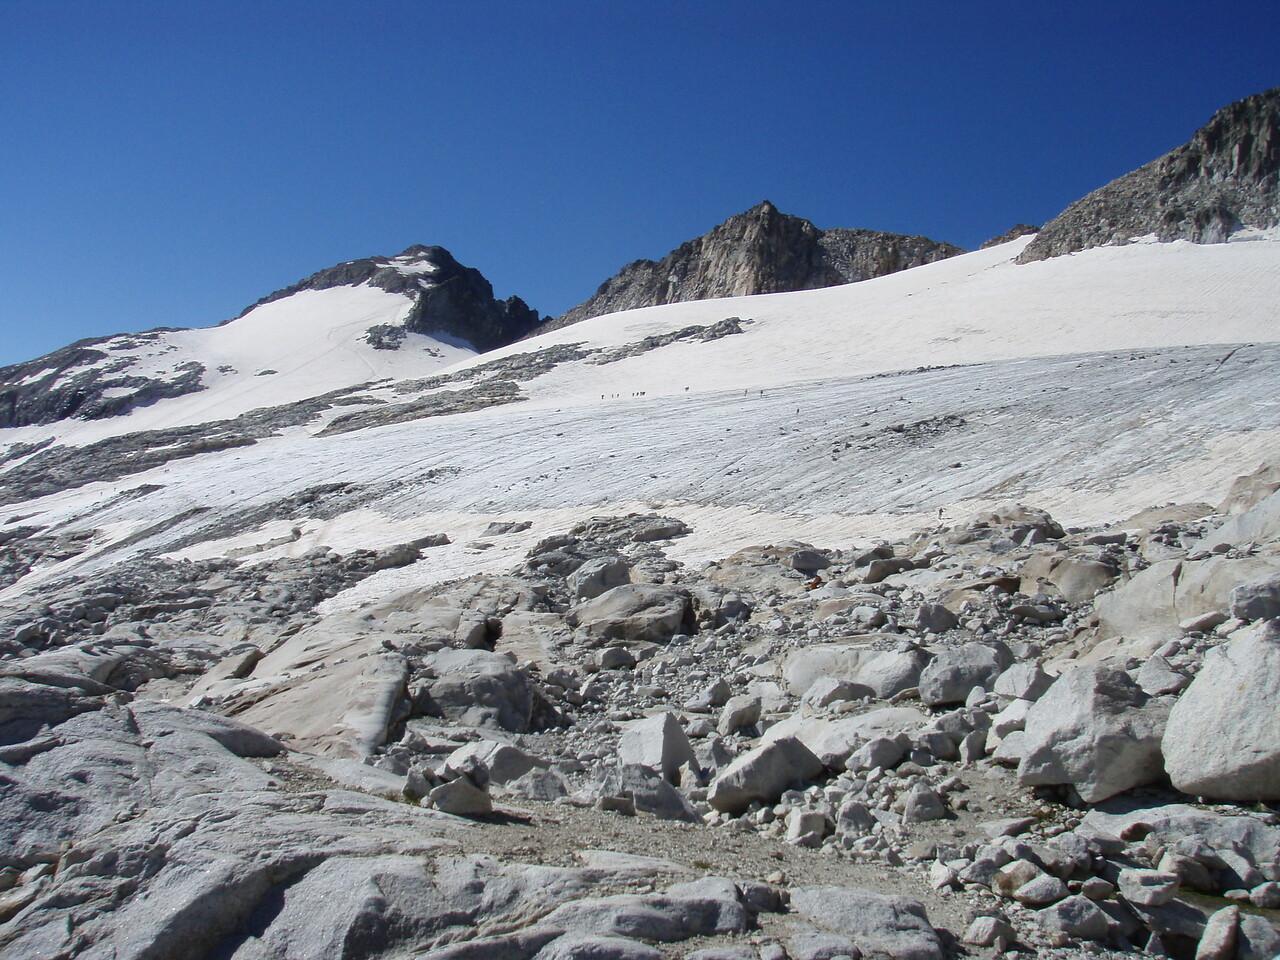 Pico Aneto 3404m from the Glaciar de Aneto